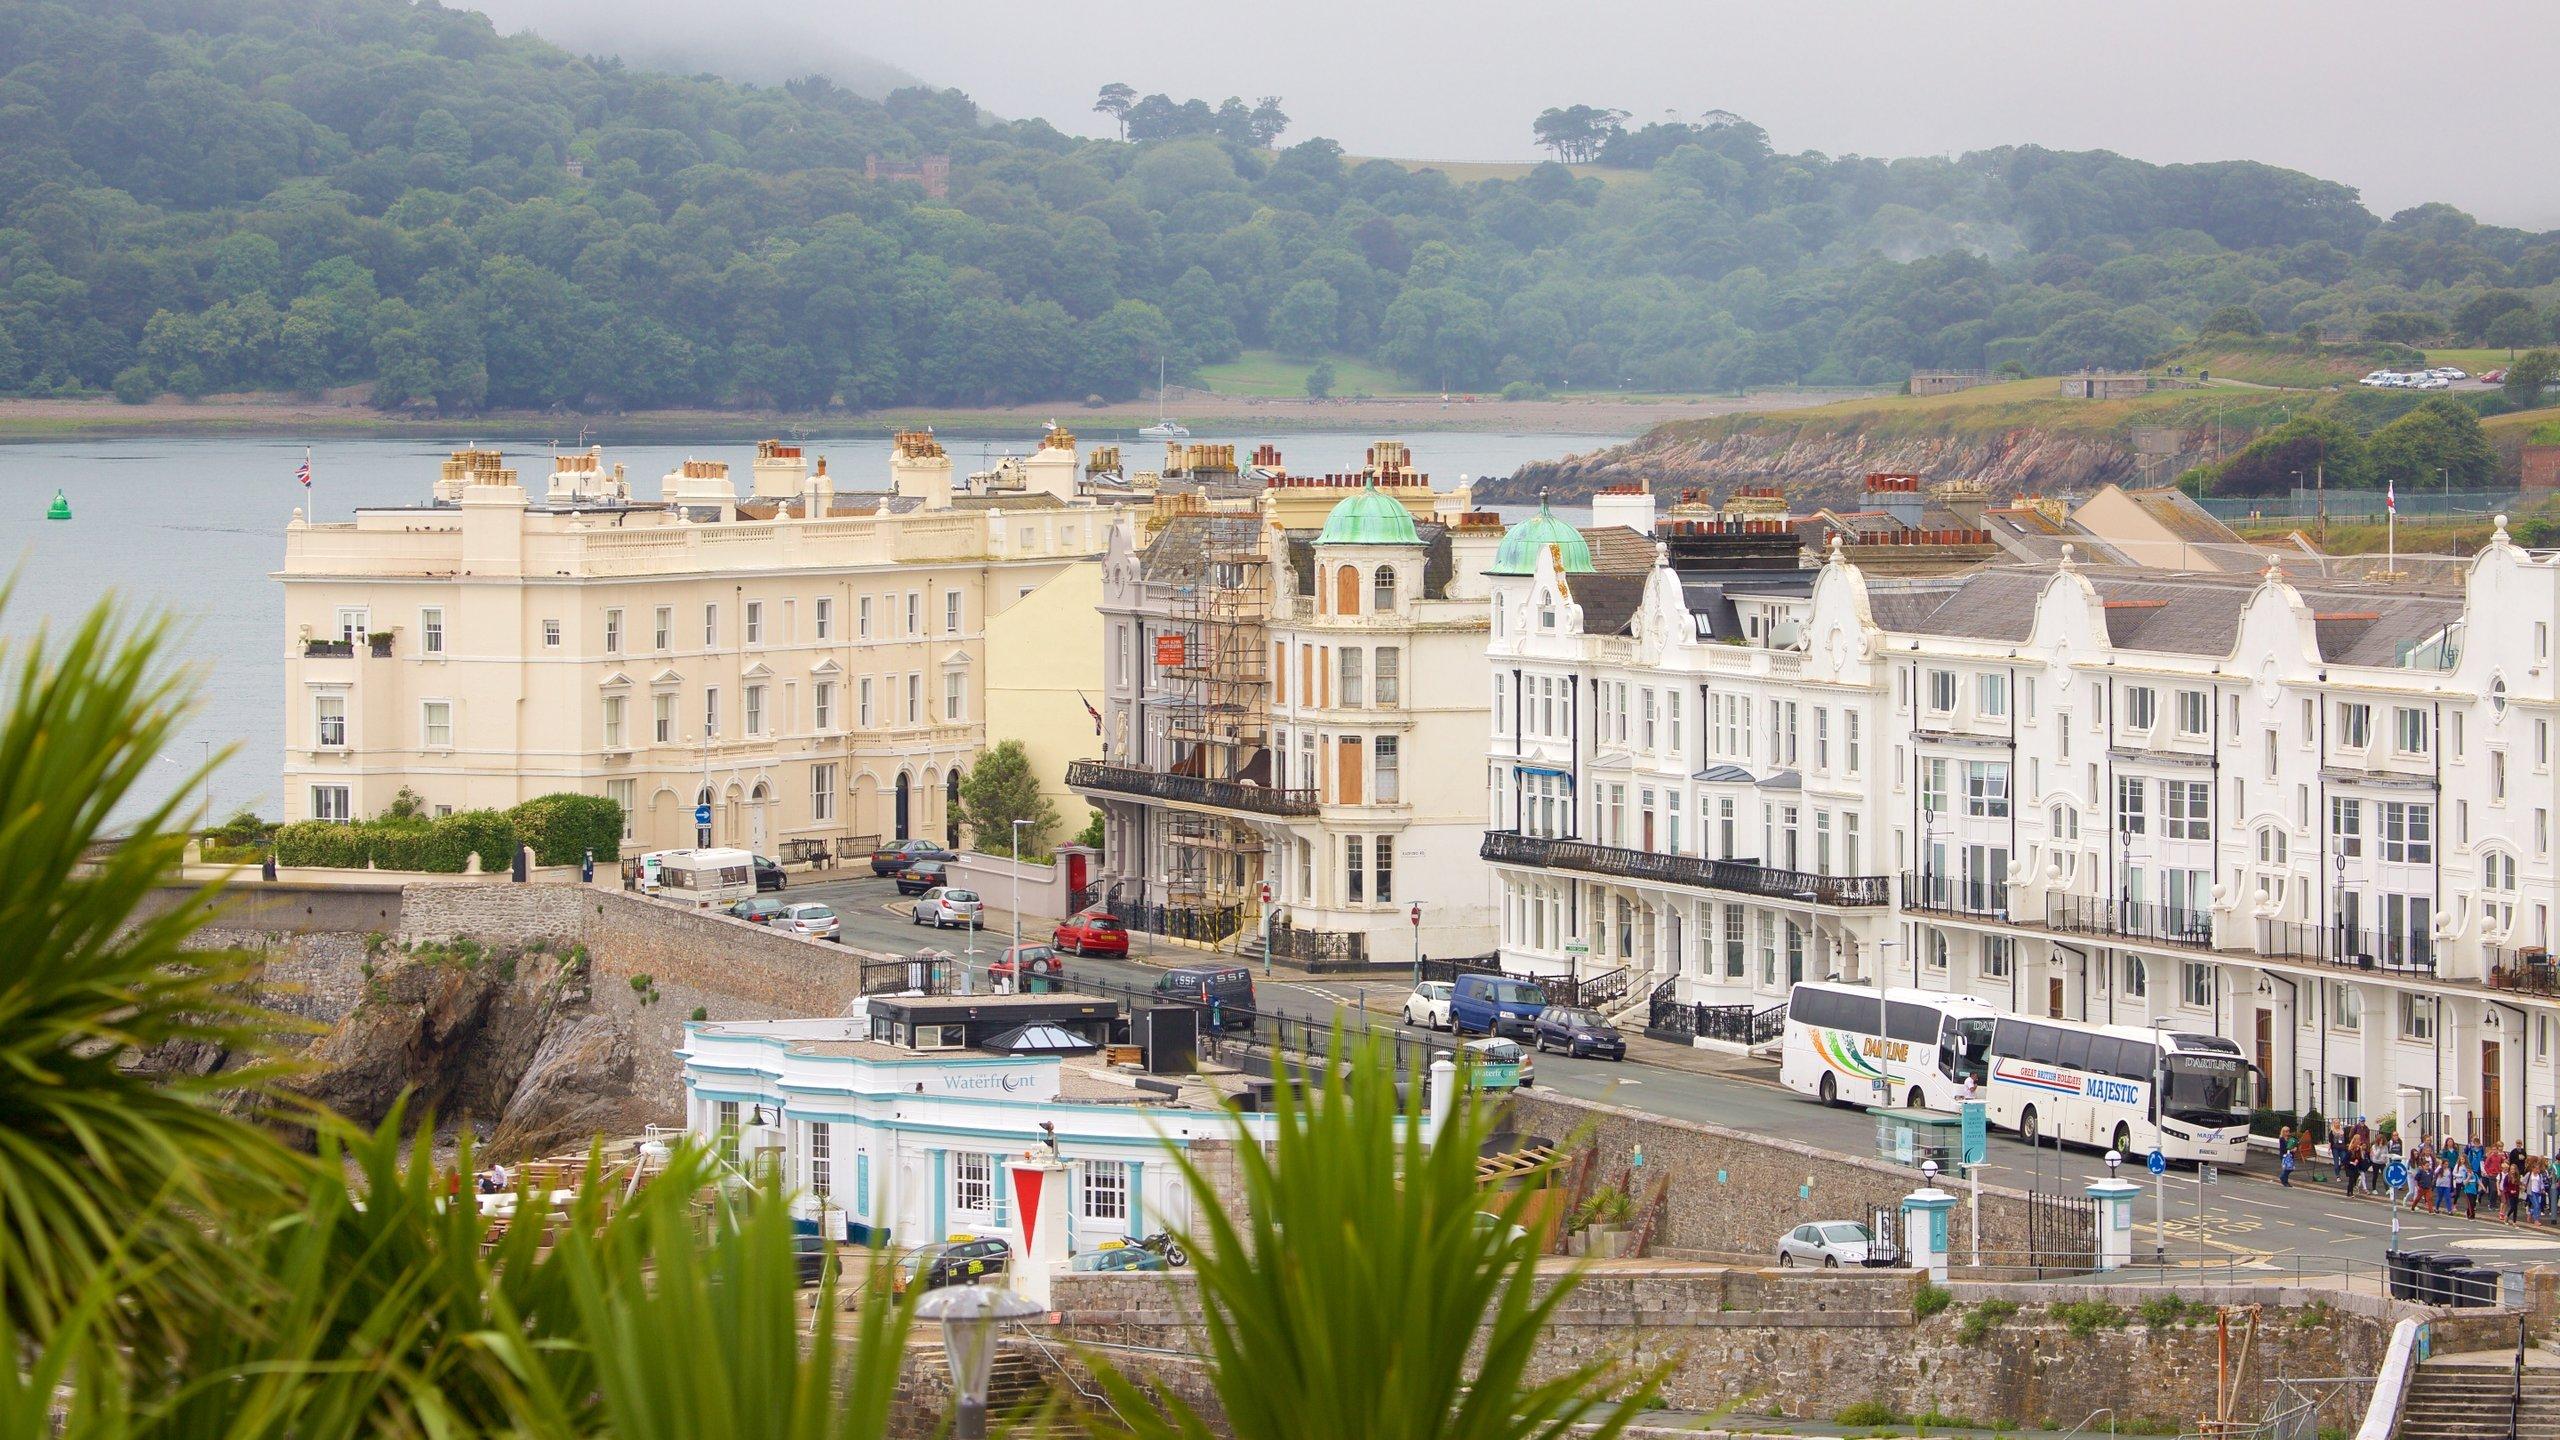 Plymouth, England, United Kingdom